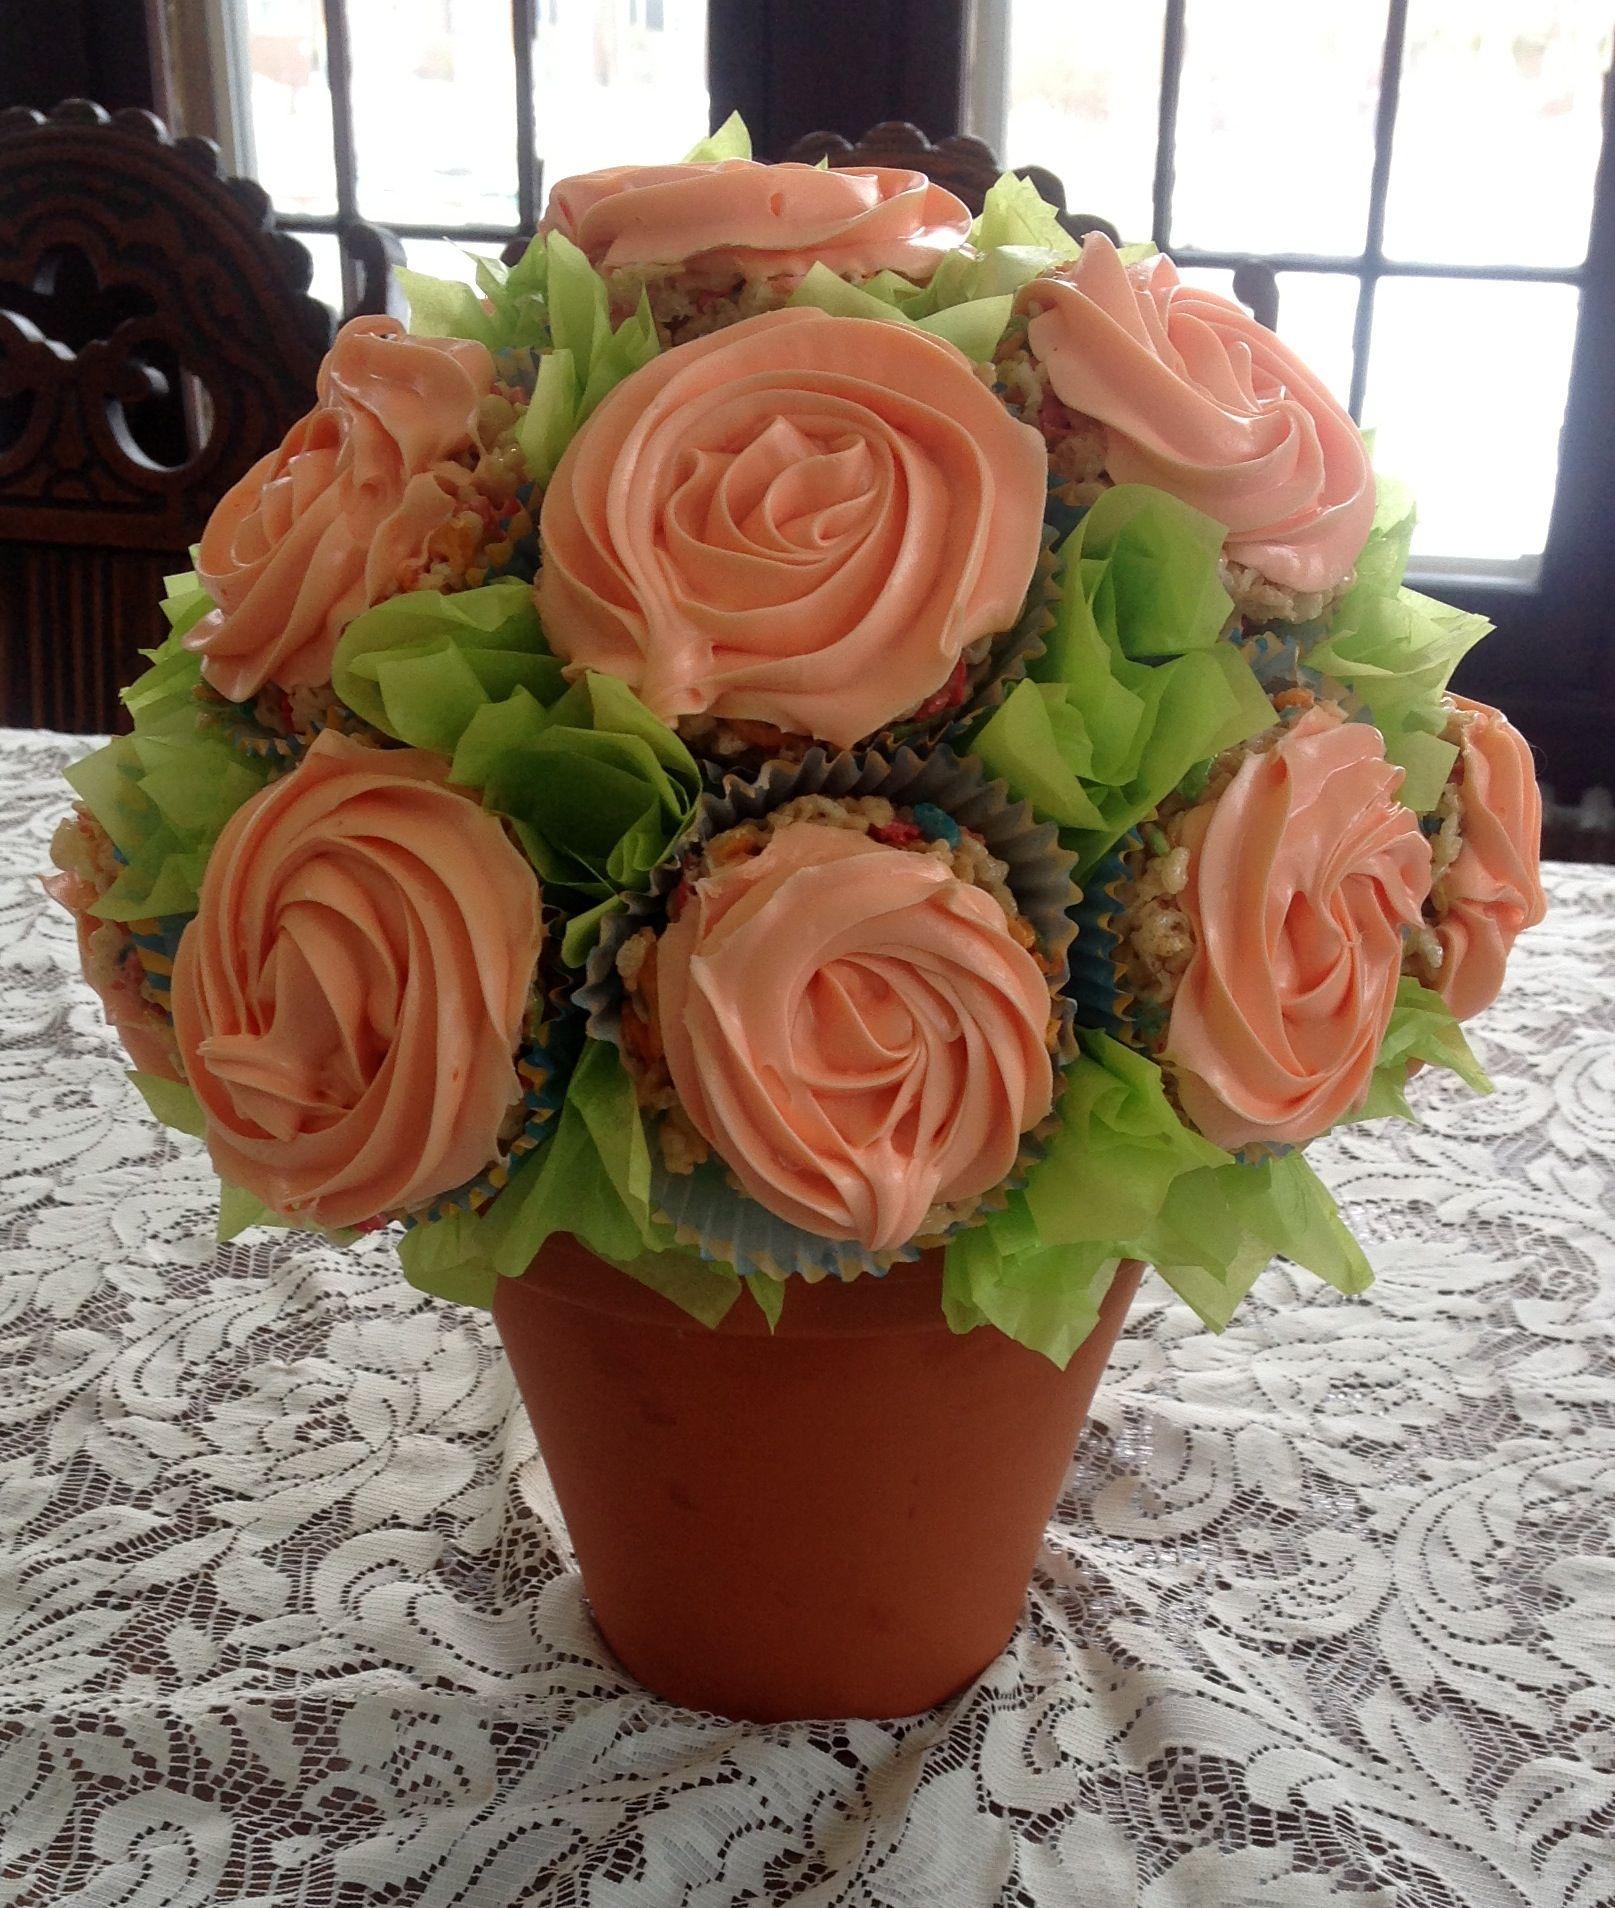 For Sue's Birthday, super easy